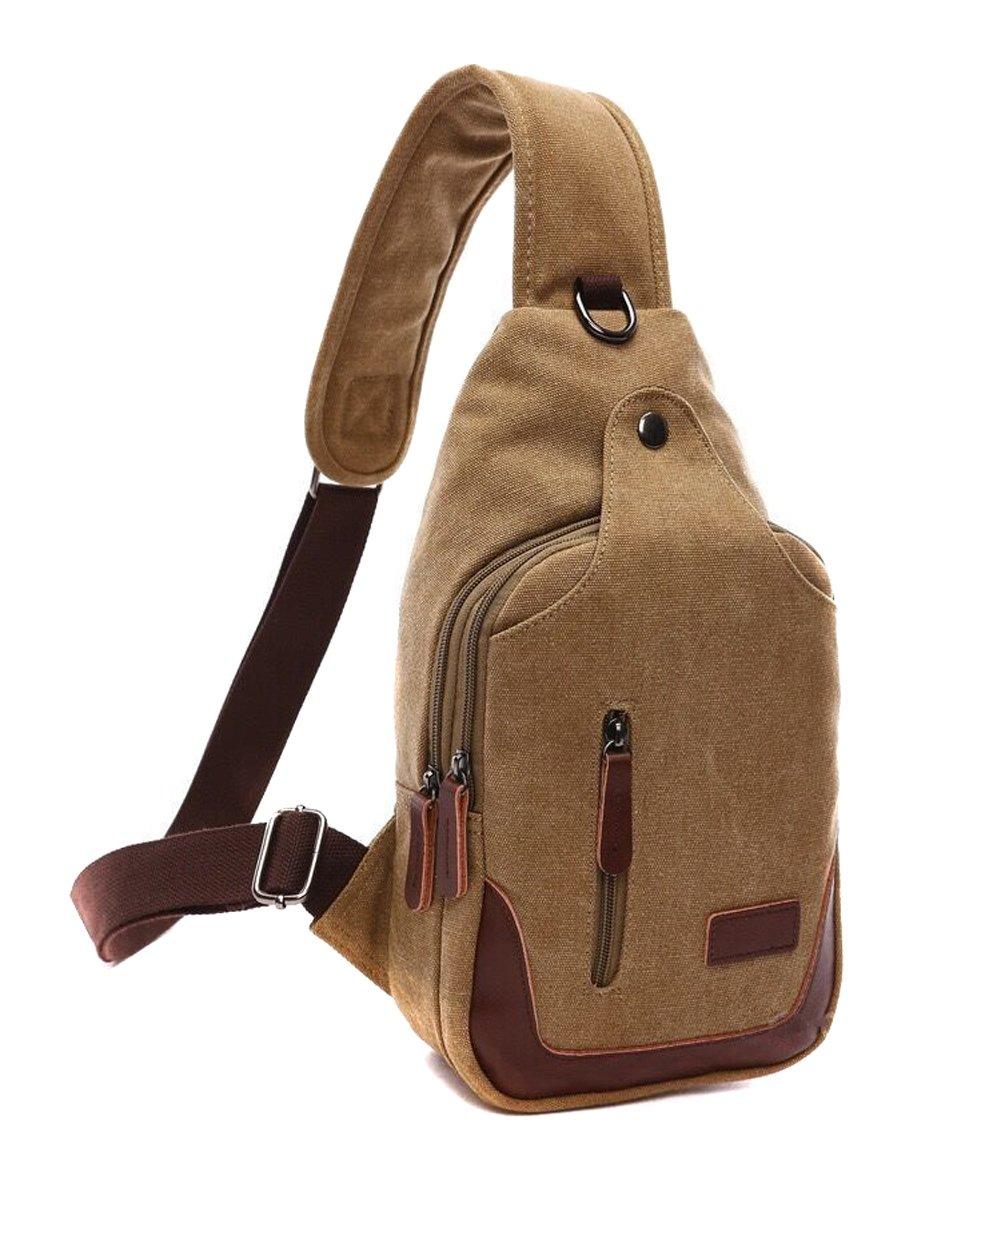 MiCoolker Fashion Retro Canvas Bag With Music Headphones Line Hole Chest Bag Multi-function Shoulder Messenger Bag